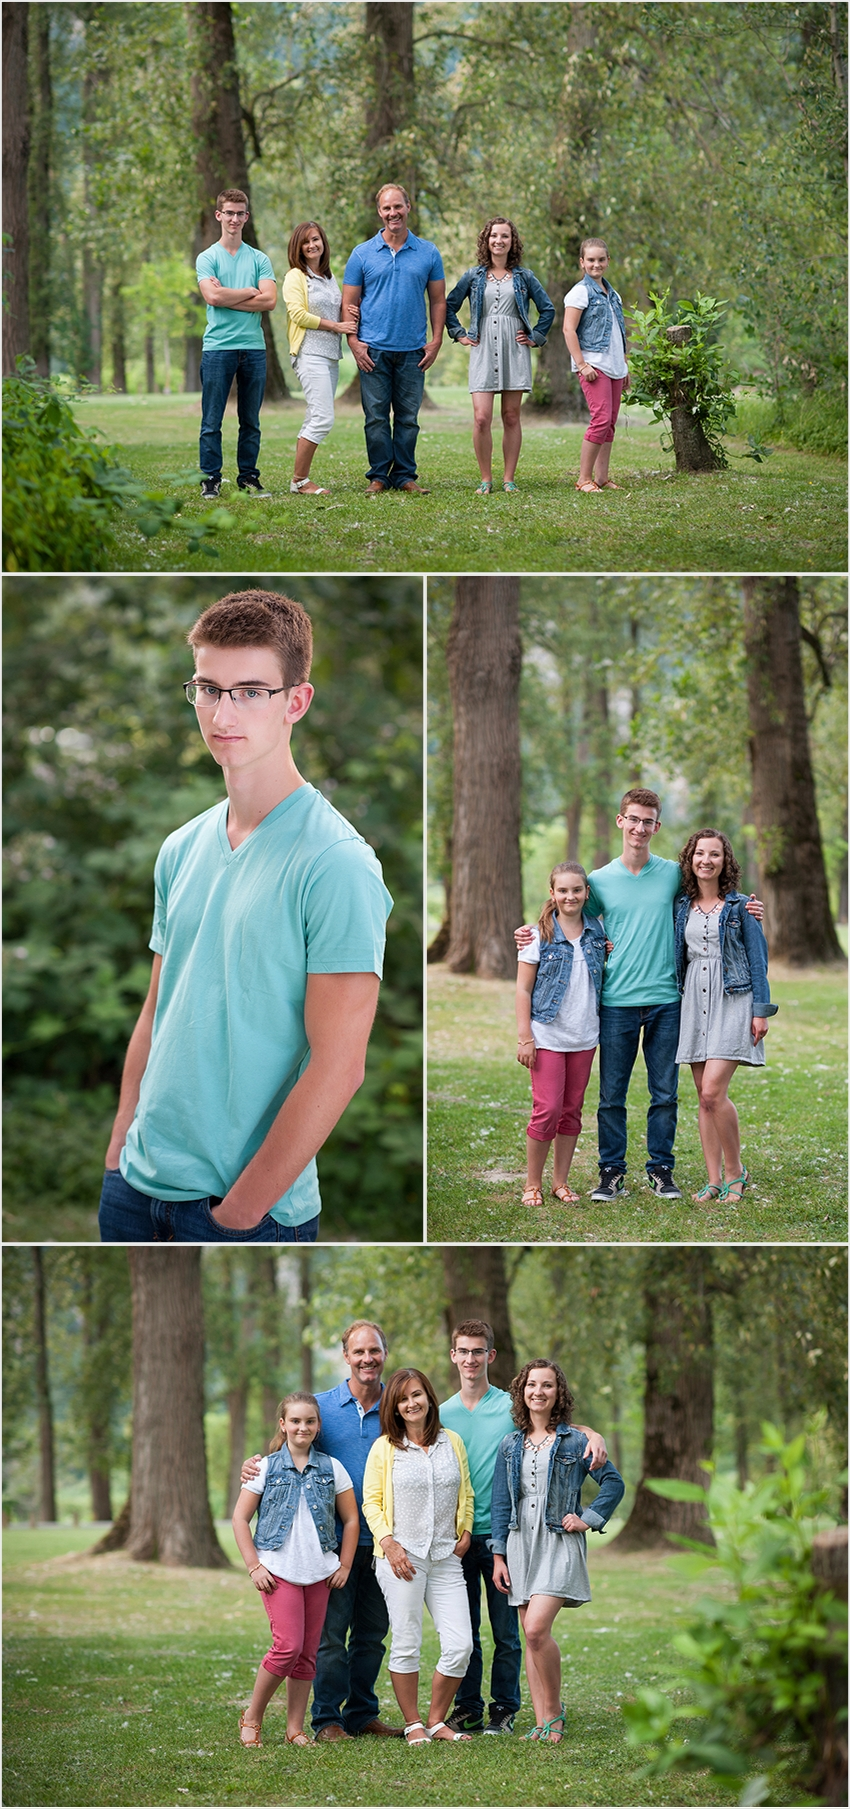 family photographer 001 (Side 1) the Falk Family and Josh's Grad